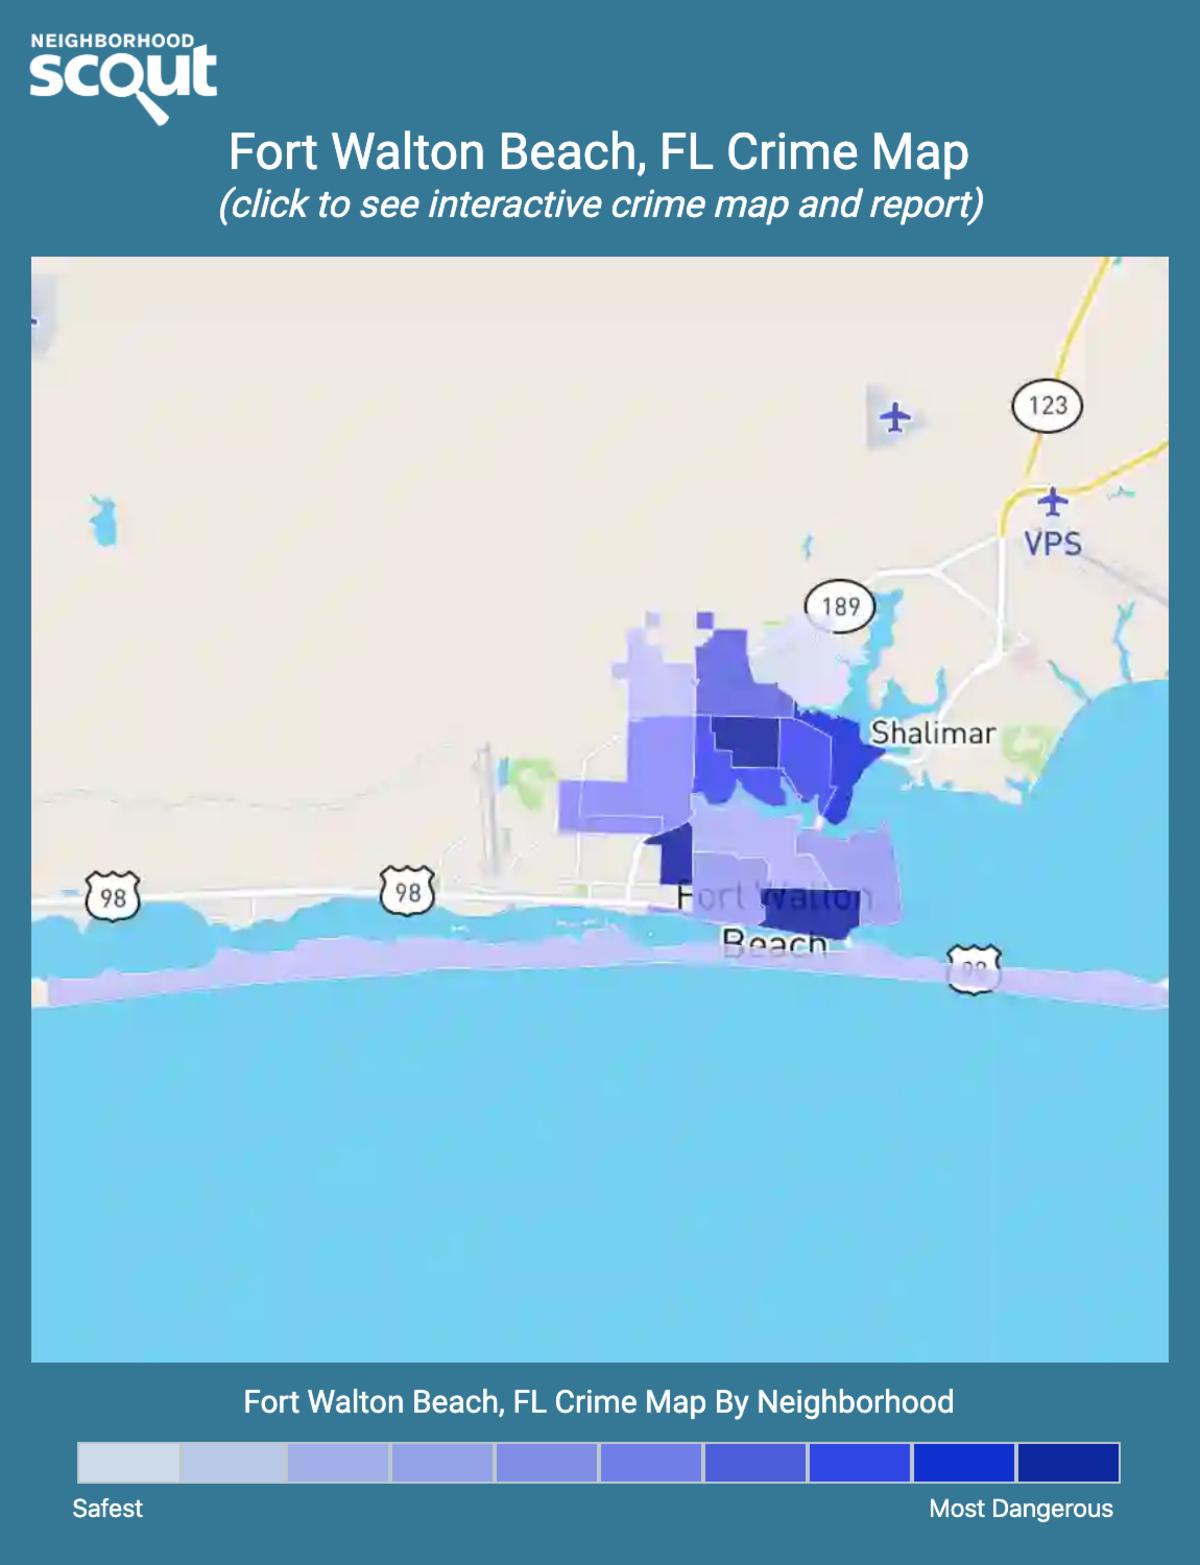 Fort Walton Beach, Florida crime map